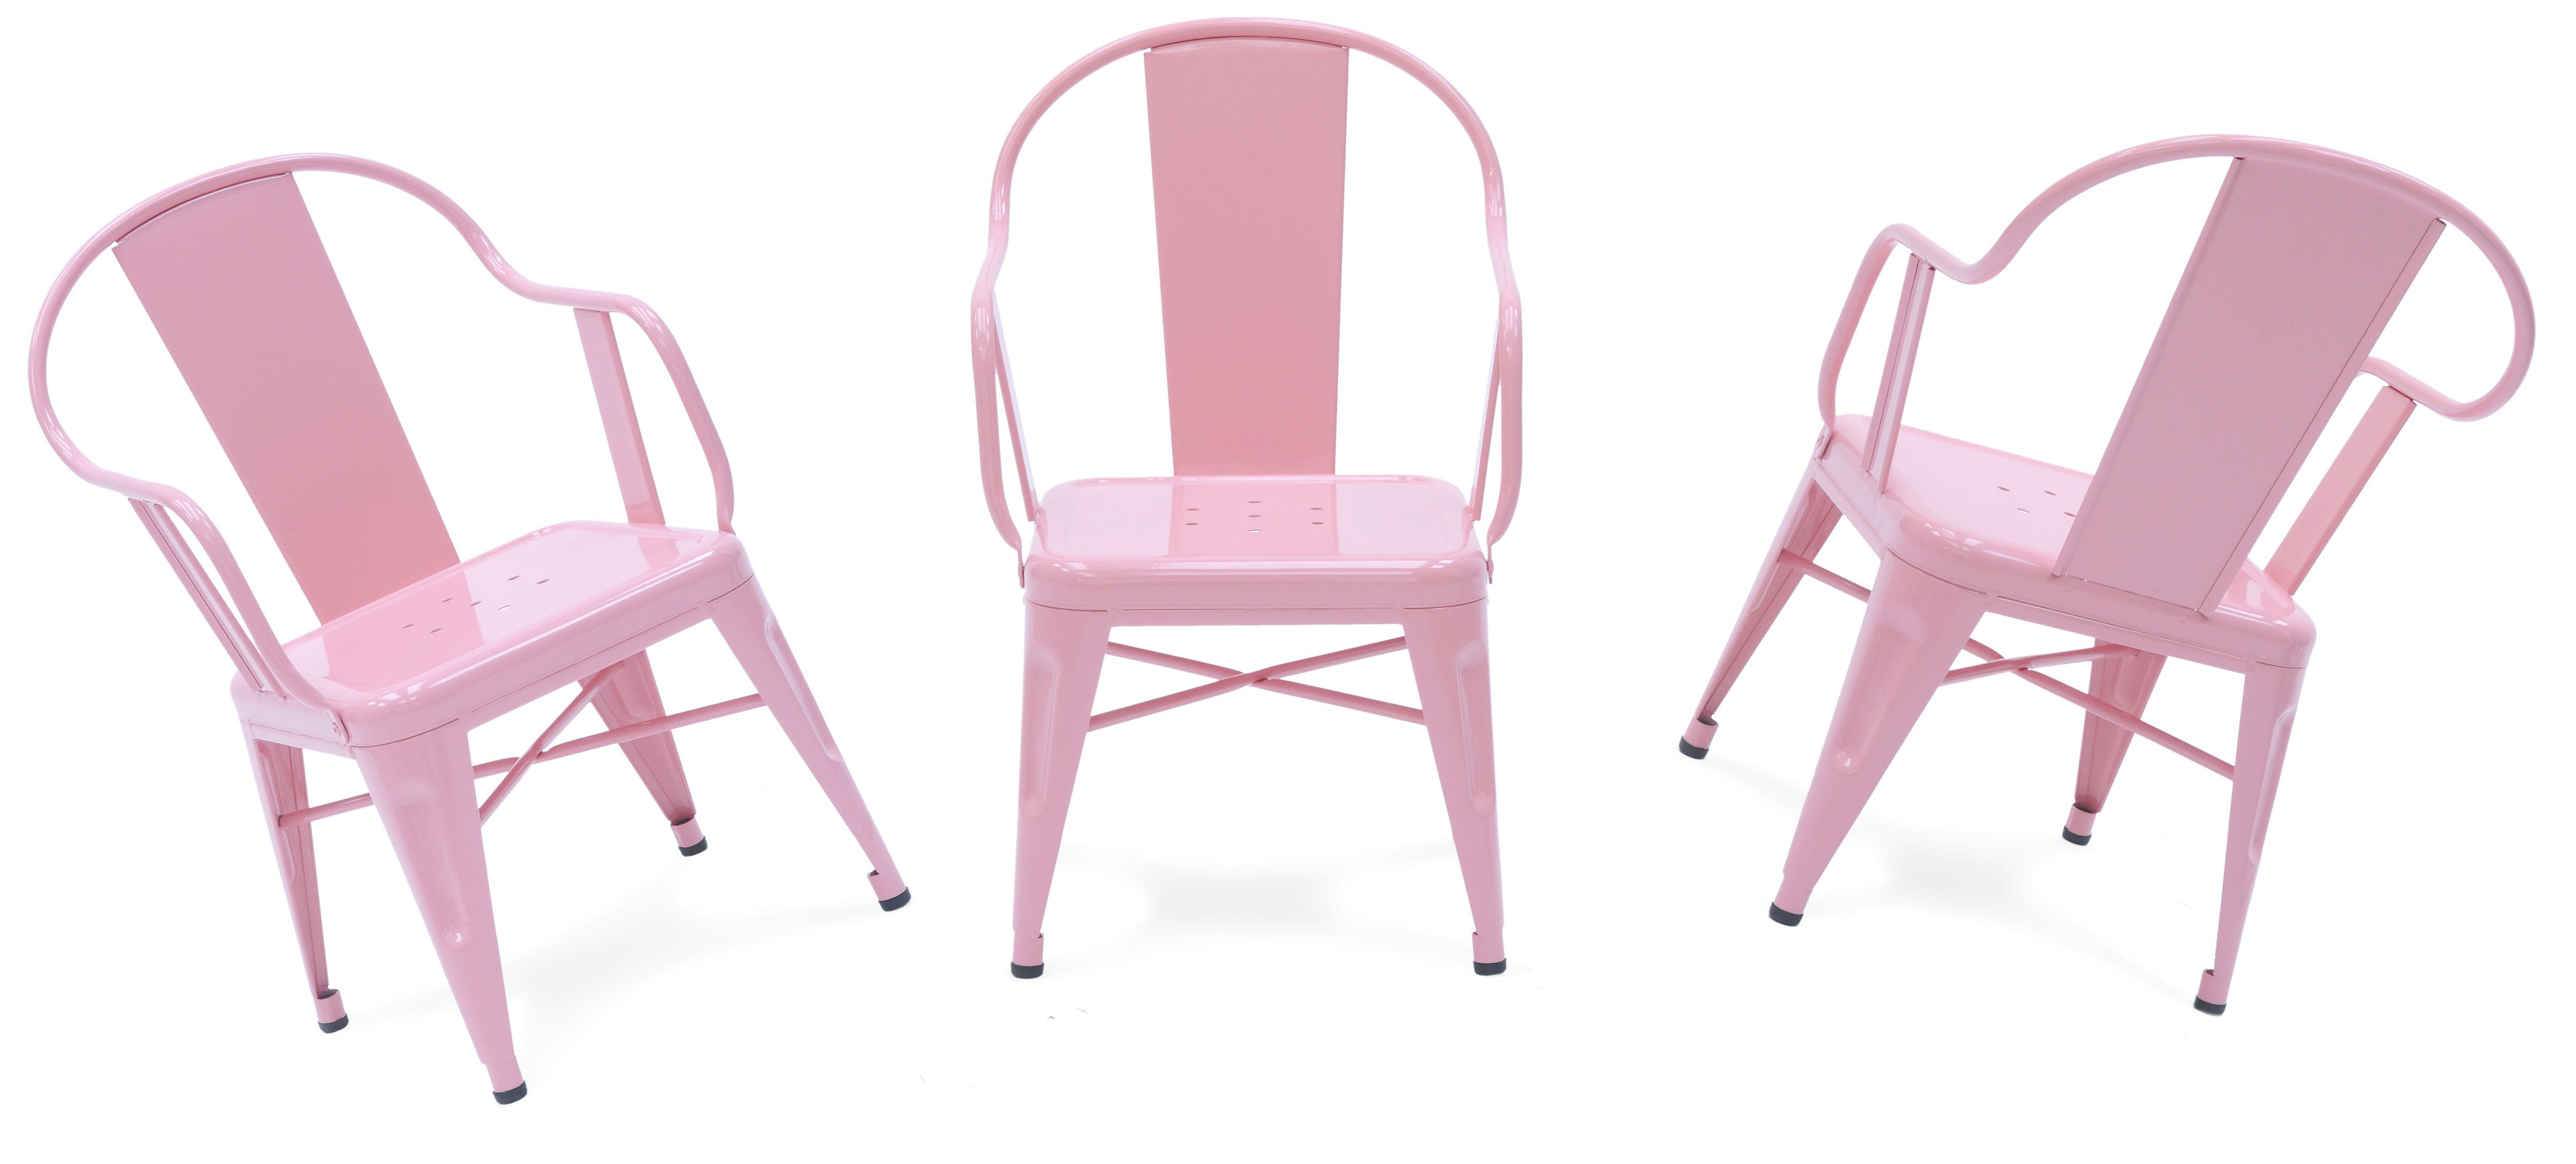 sillas pink tolix muebles mallorca